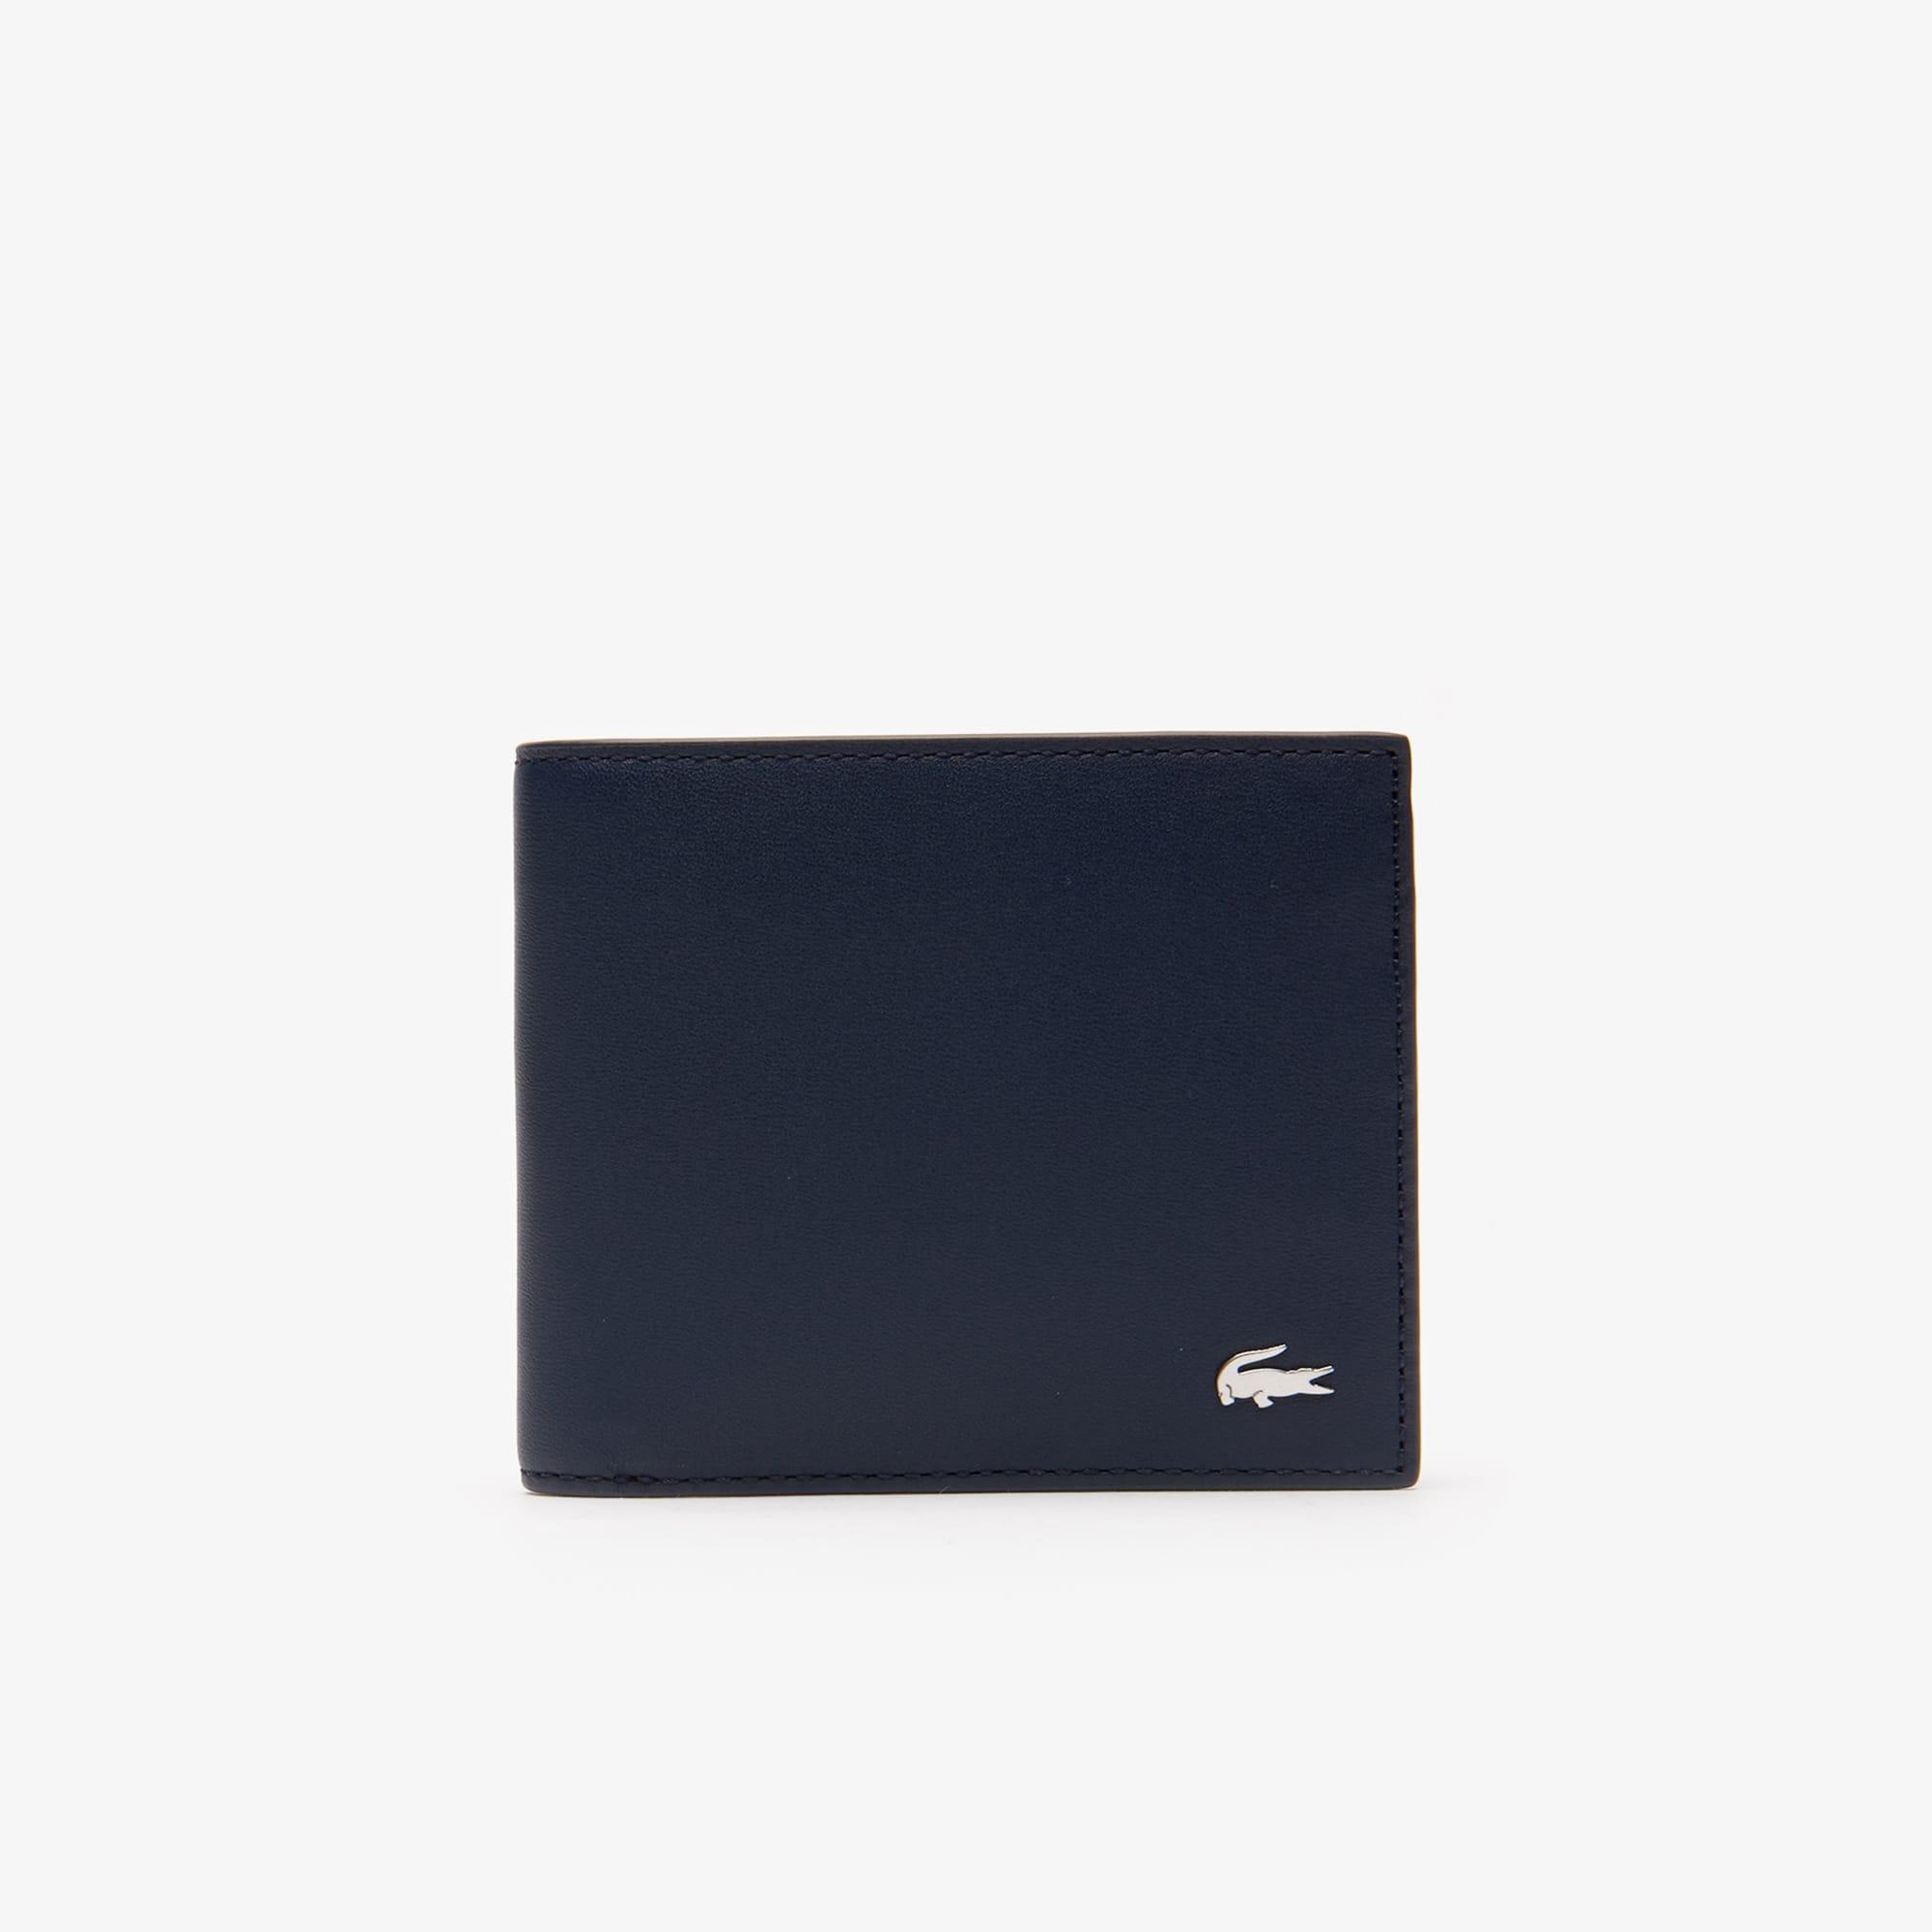 Portefeuille Fitzgerald en cuir color-block 3 cartes 601c38d655f